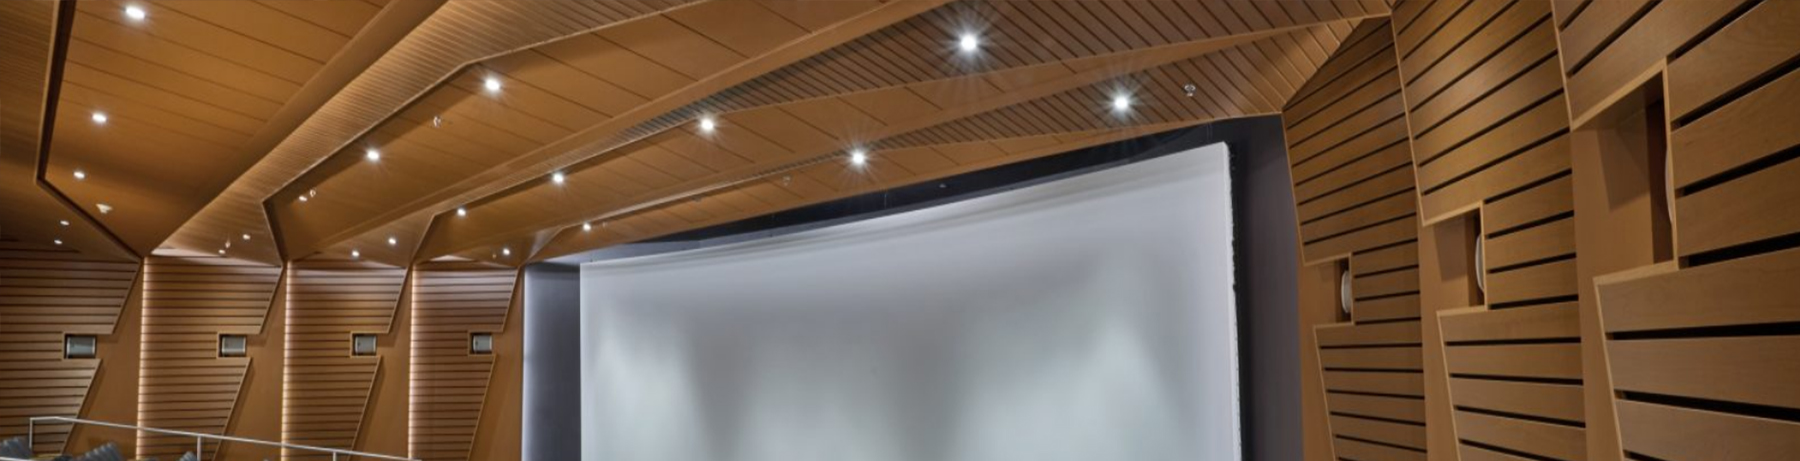 Acoustical Walls - Wood Wall Panels